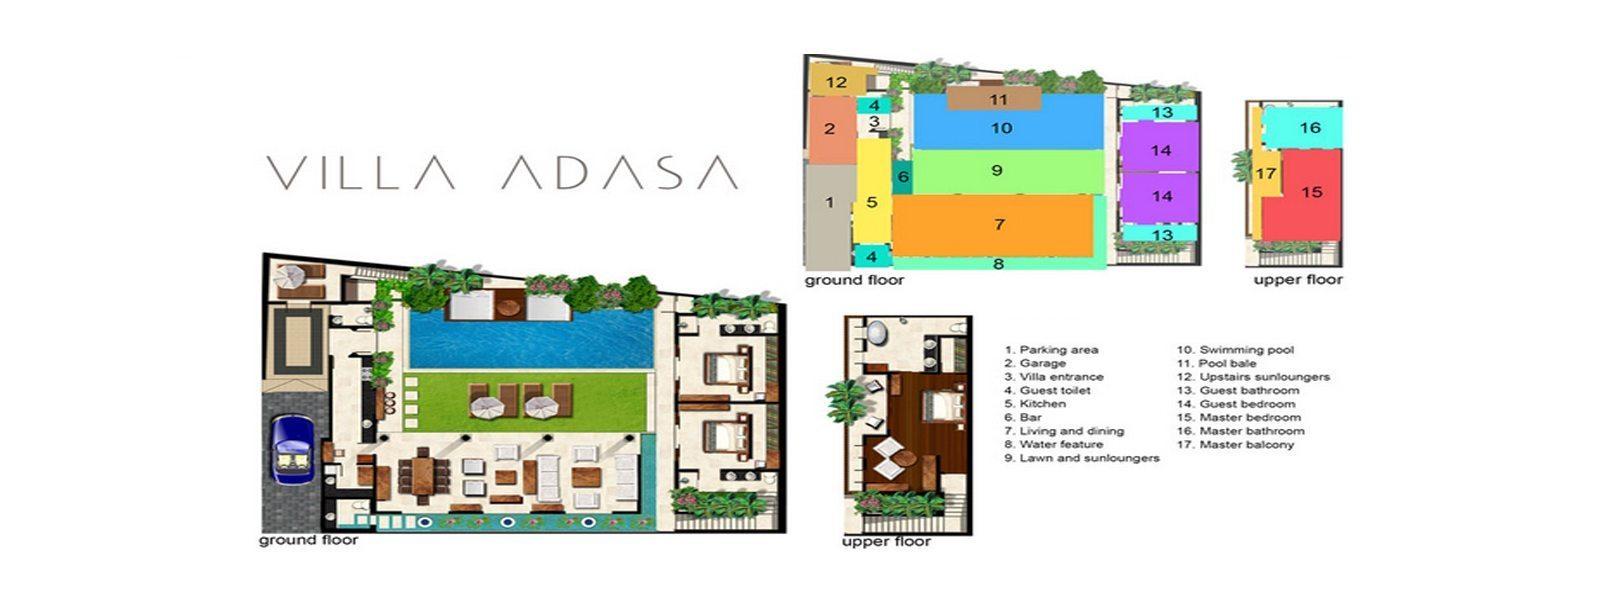 Villa Adasa Floorplan | Seminyak, Bali